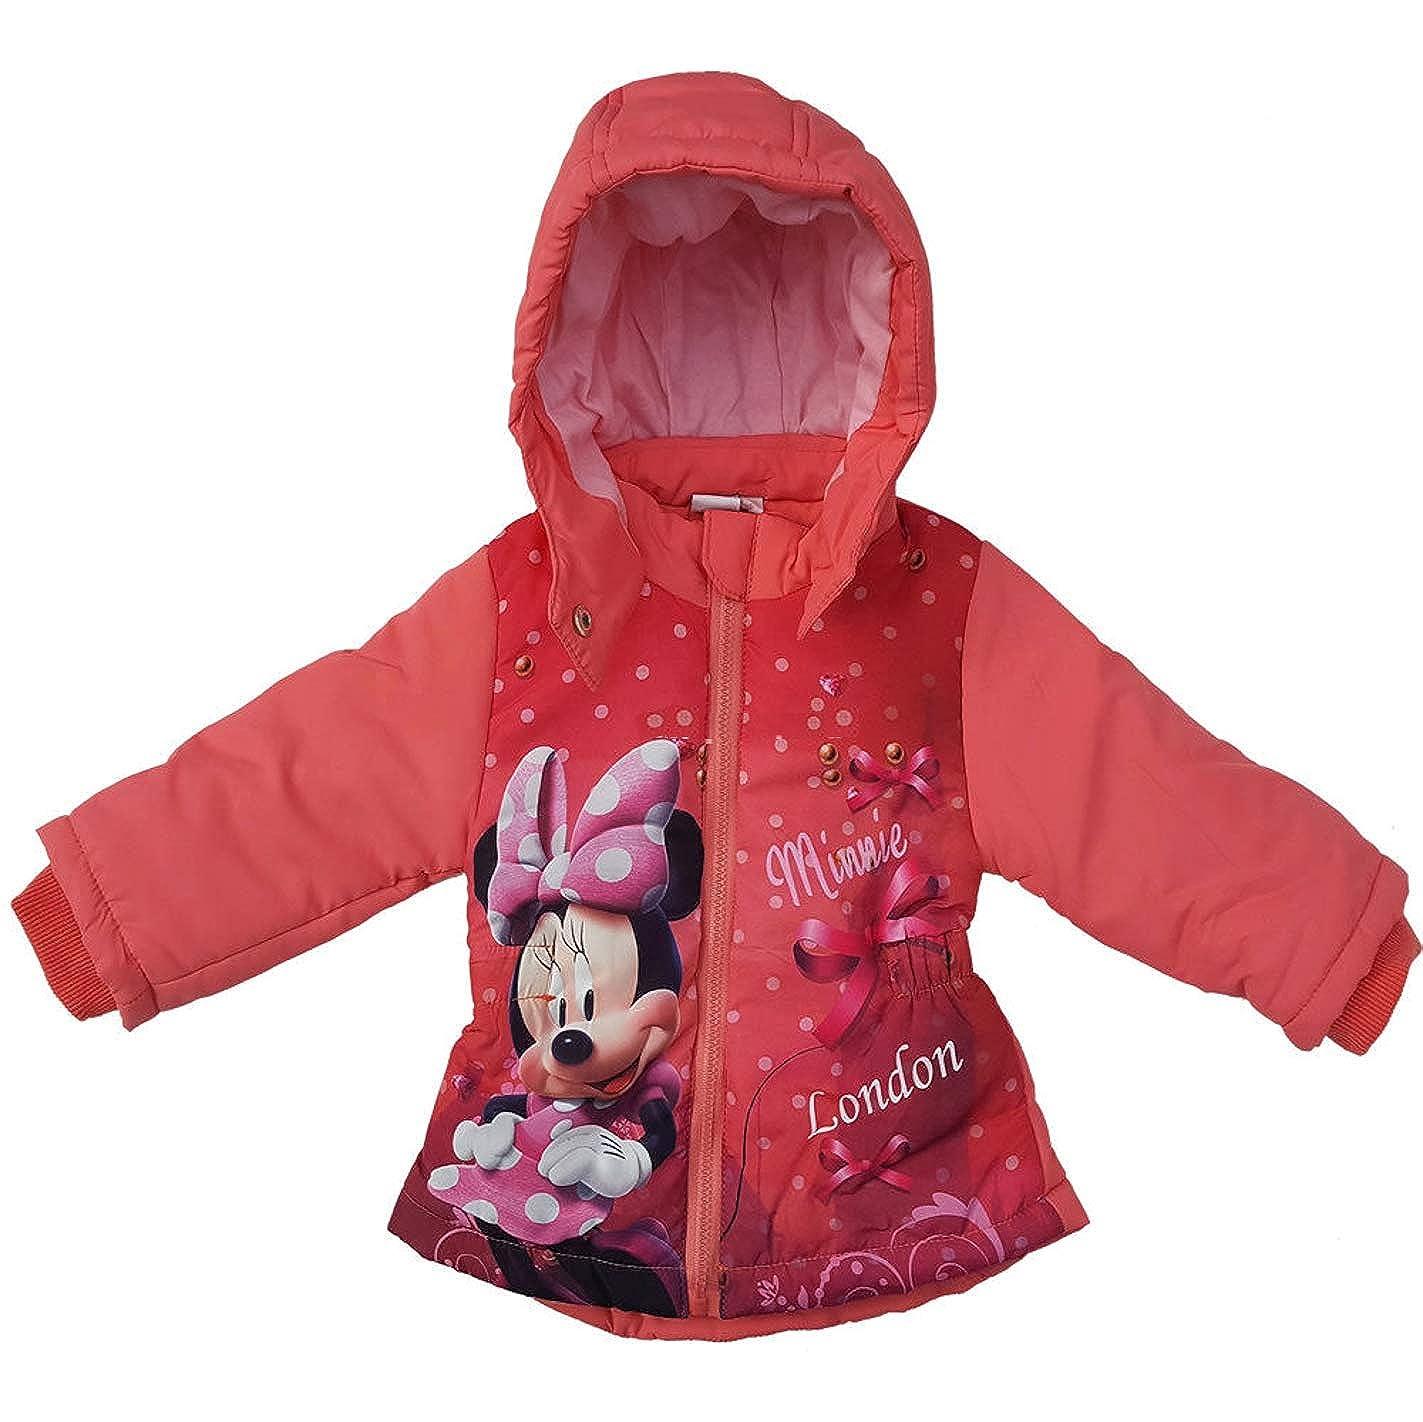 Winter-gef/üttert mit Kapuze Minnie Mouse tolles Geschenk Rot Disney Minnie Mouse Kinderjacke f/ür den Winter//Winterjacke Mantel Parka//lang Longjacke Jacke f/ür Baby//M/ädchen Kinder